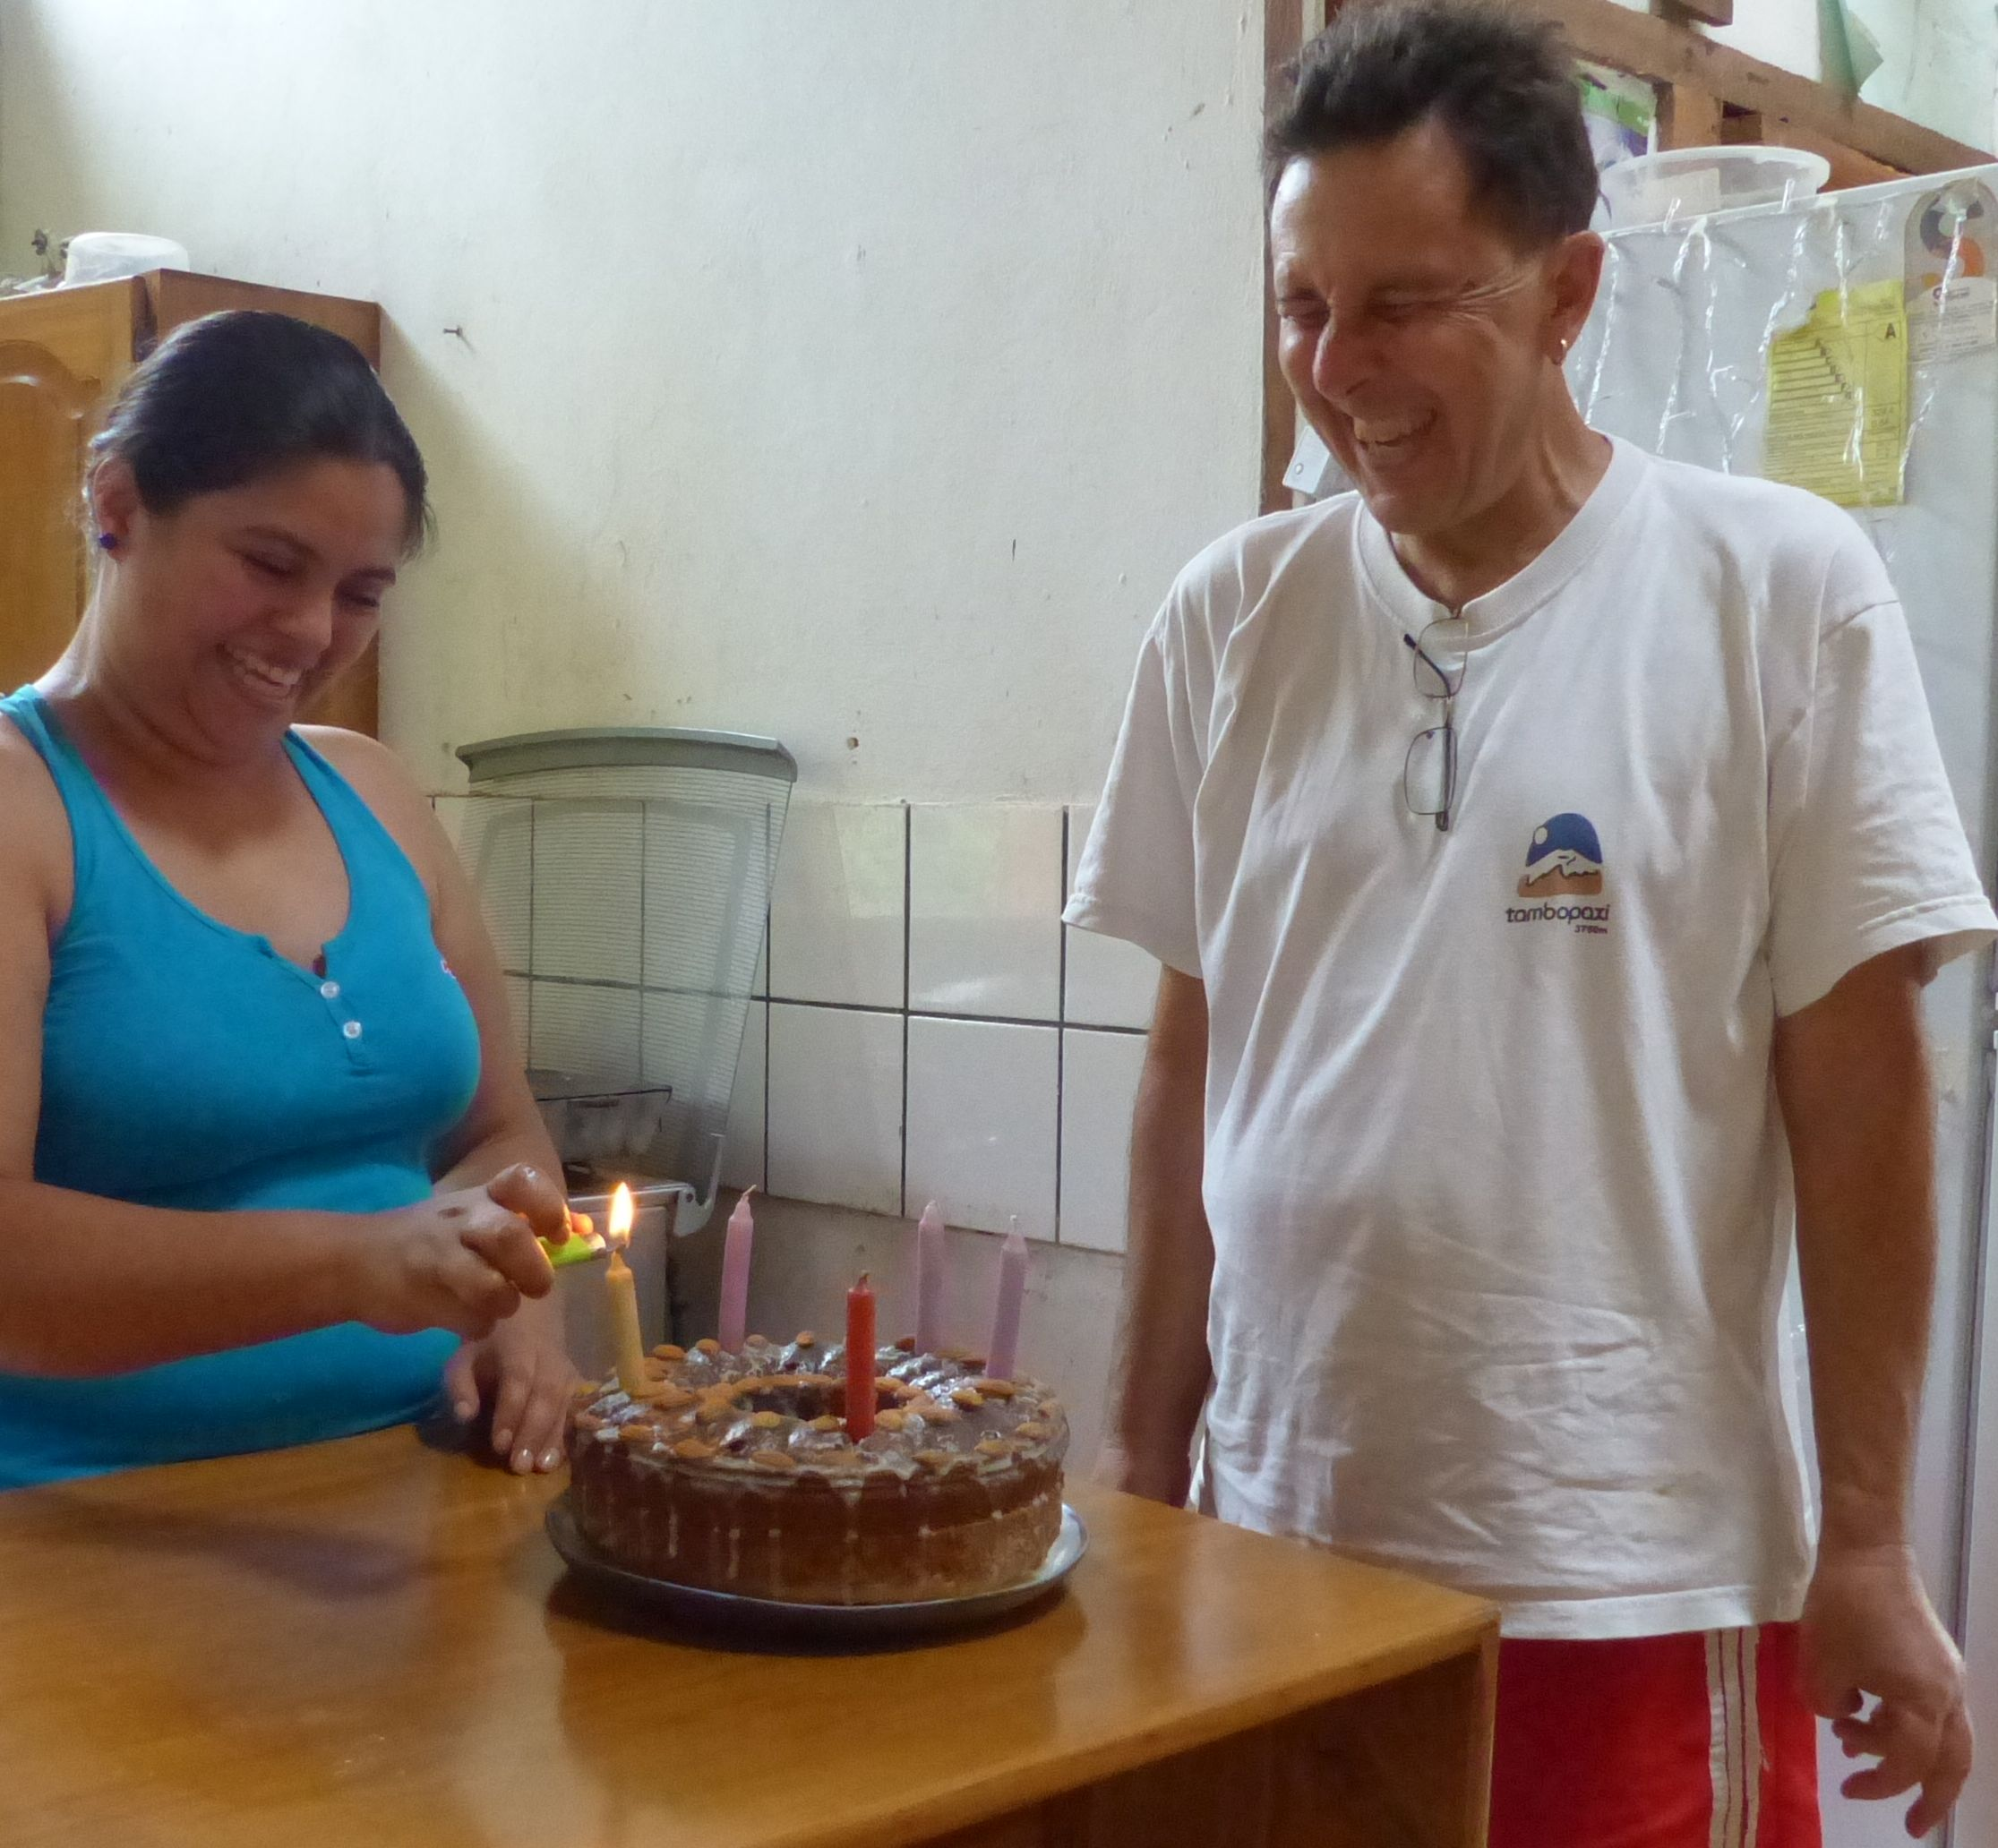 P1730702 BIRTHDAY CAKE CHUCKLES JORGE Y MELISSA